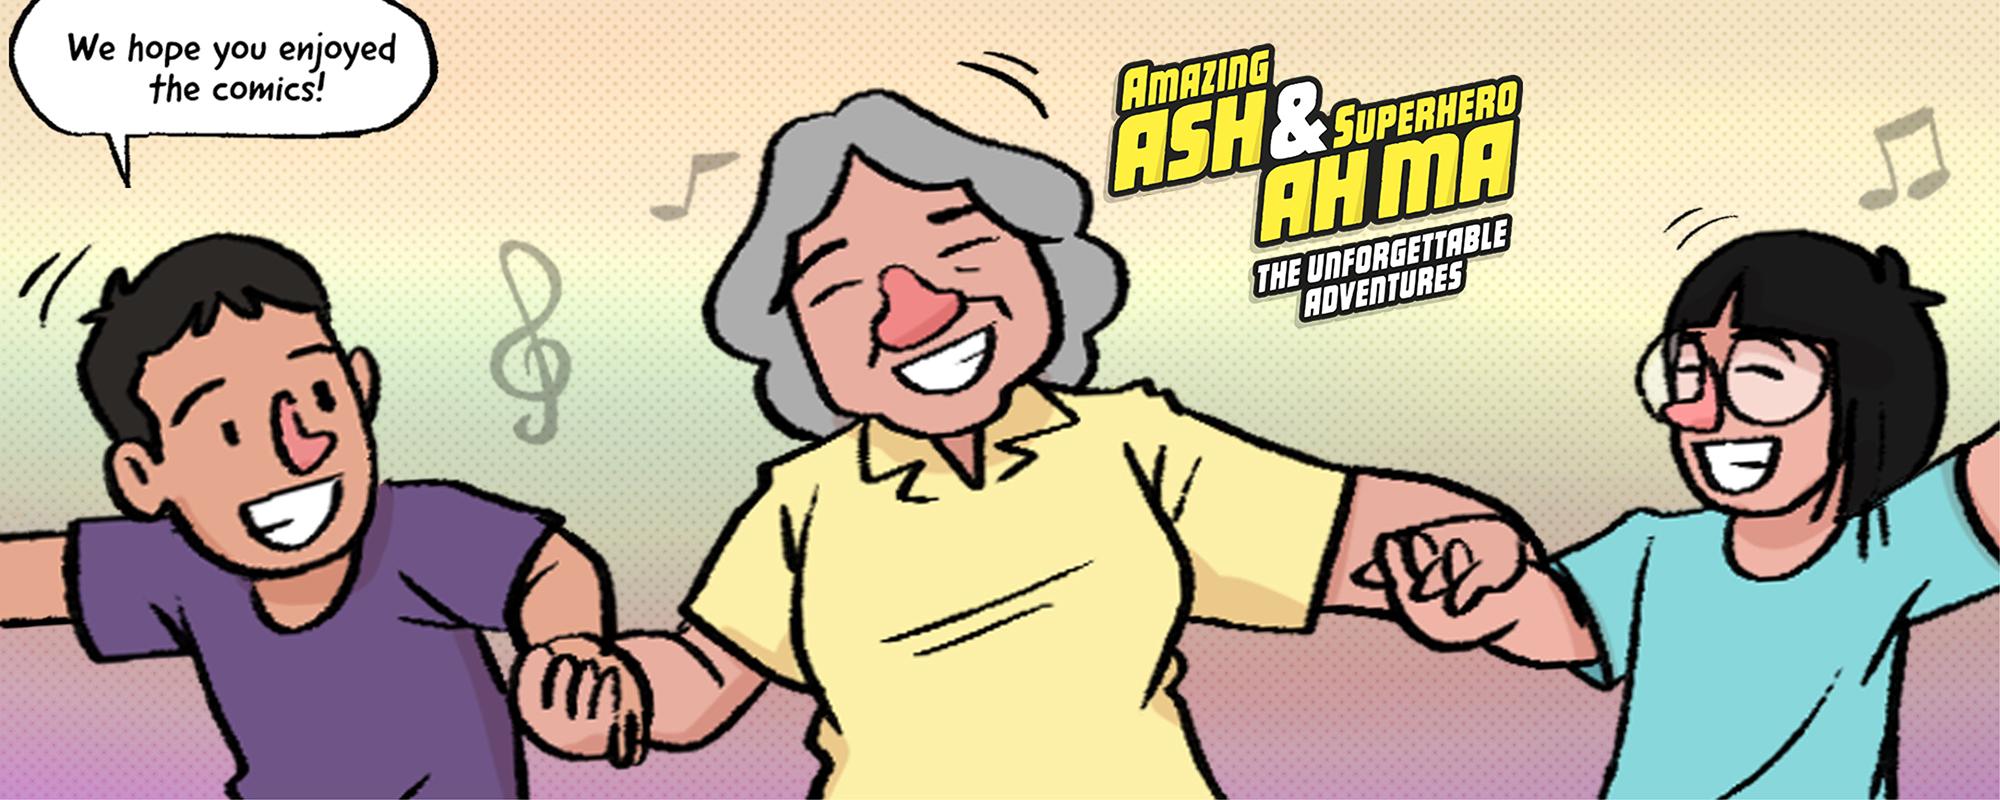 Amazing Ash & Superhero Ah Ma: The Unforgettable Adventures